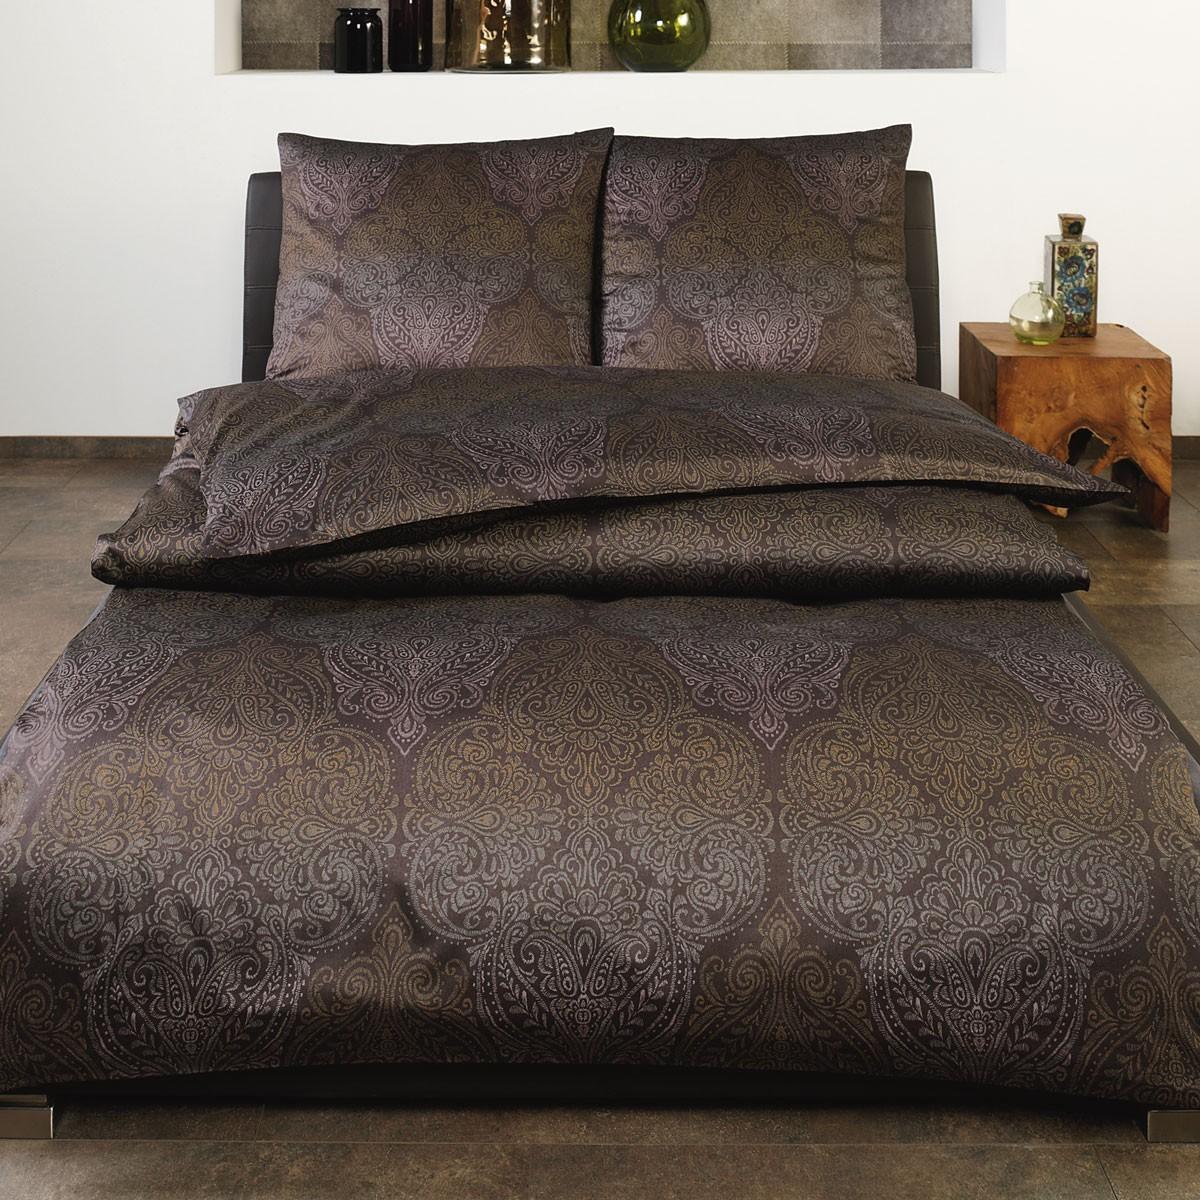 bettw sche estella edin 7409 messing. Black Bedroom Furniture Sets. Home Design Ideas